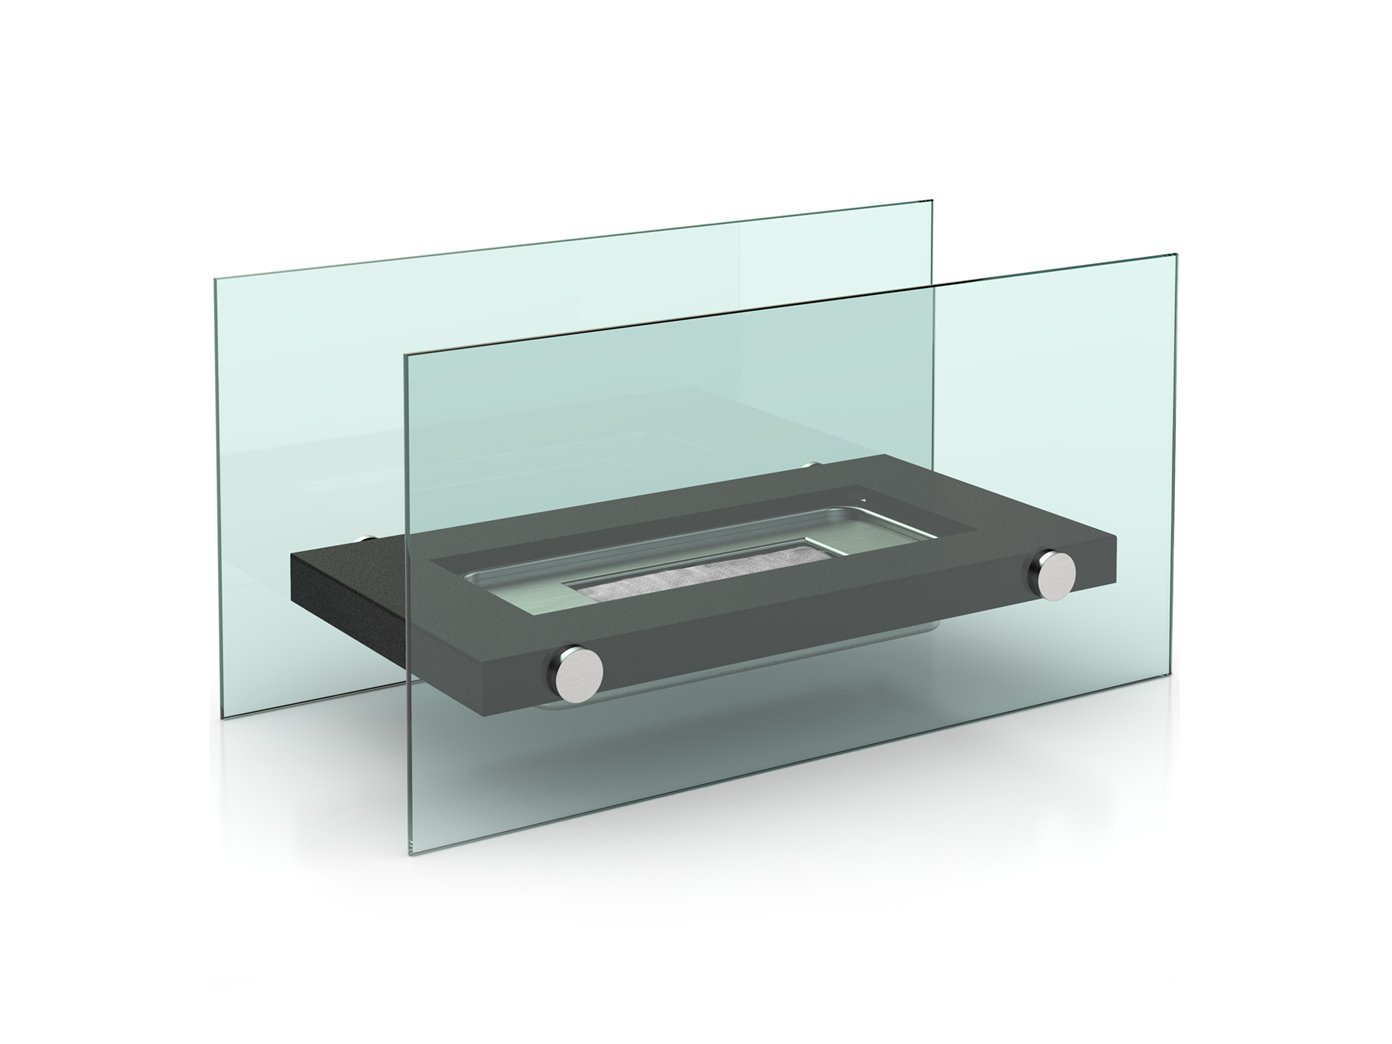 deko tischkamin glaskamin feuerschale. Black Bedroom Furniture Sets. Home Design Ideas